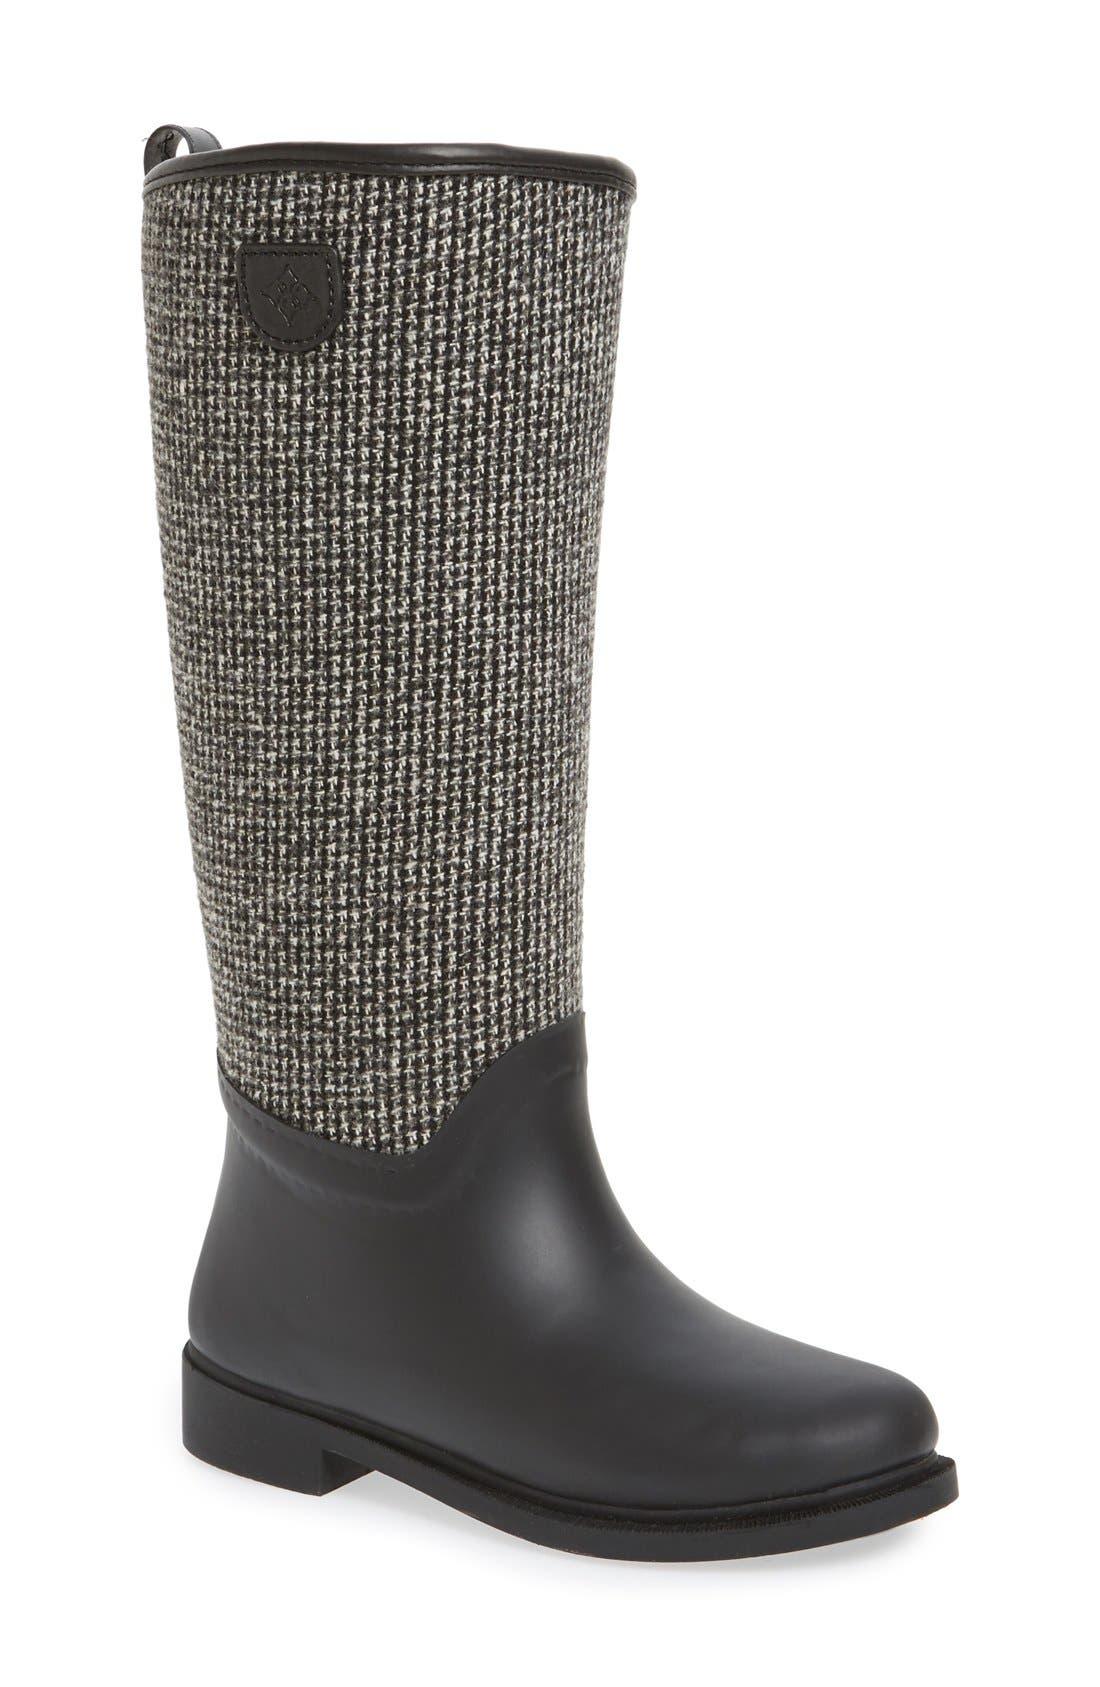 DÄV, Cardiff Tweed Knee High Waterproof Rain Boot, Main thumbnail 1, color, BLACK